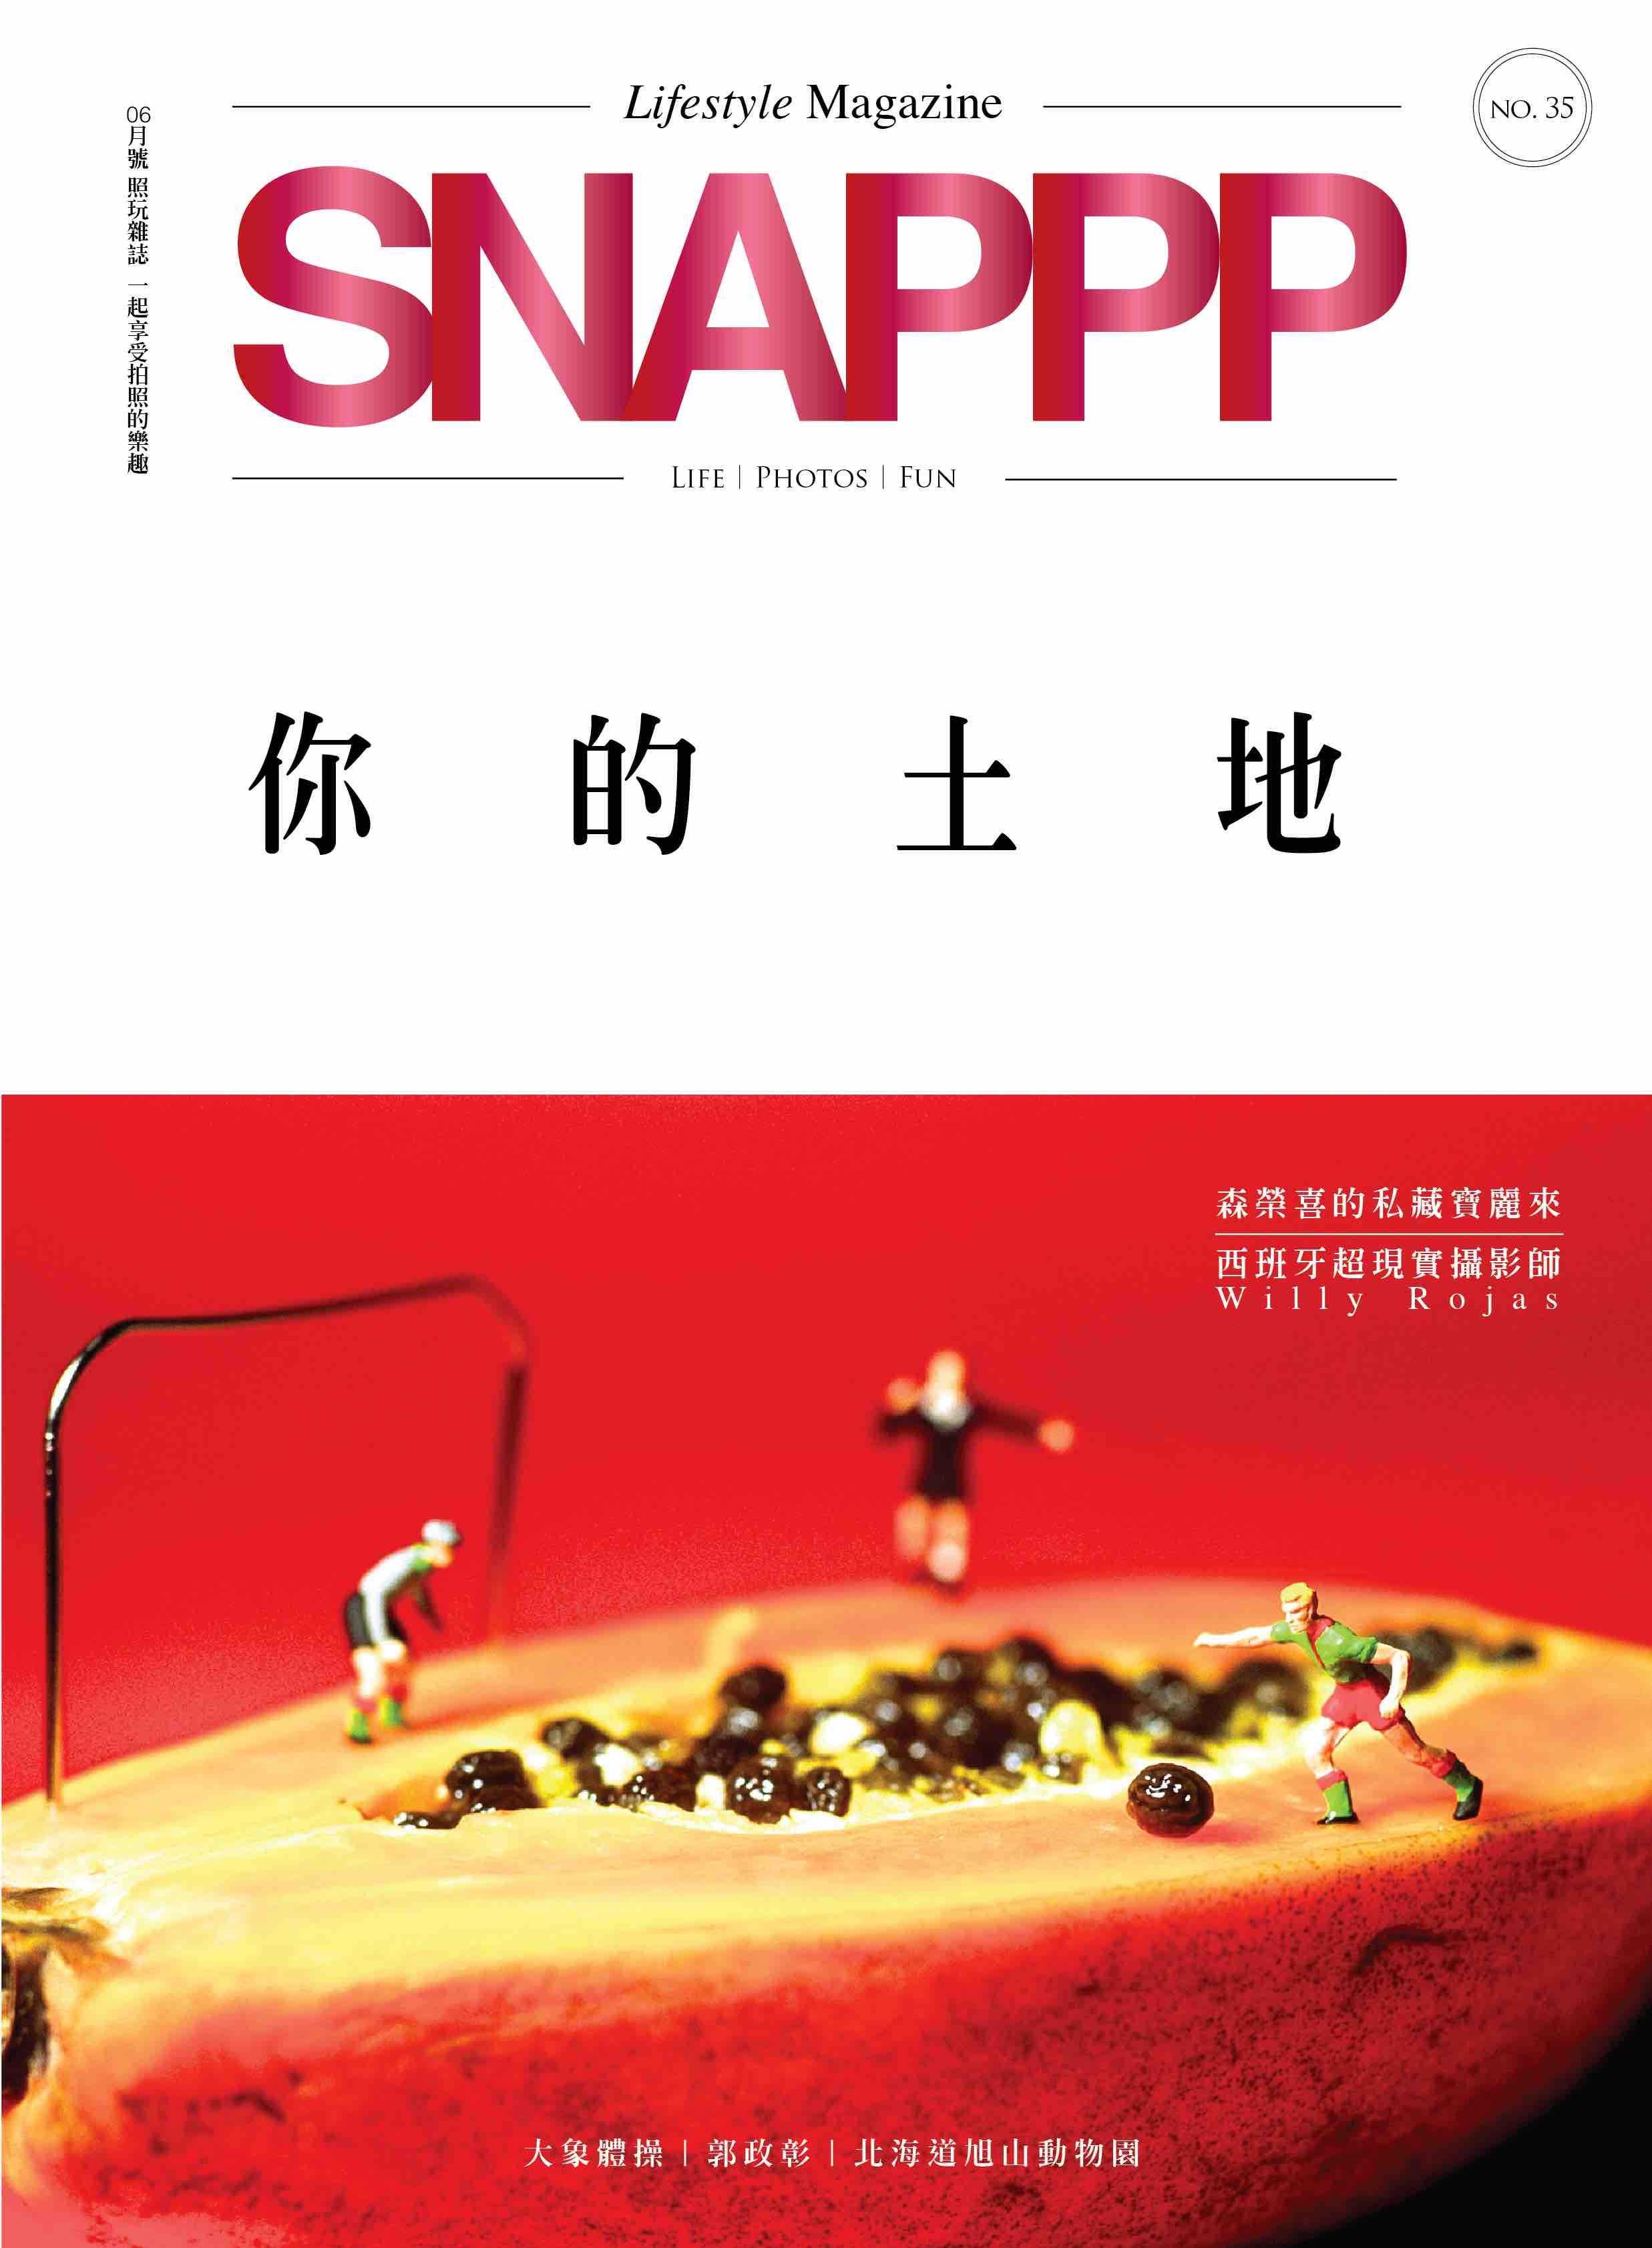 SNAPPP-NO35 COVER-ver2.jpg